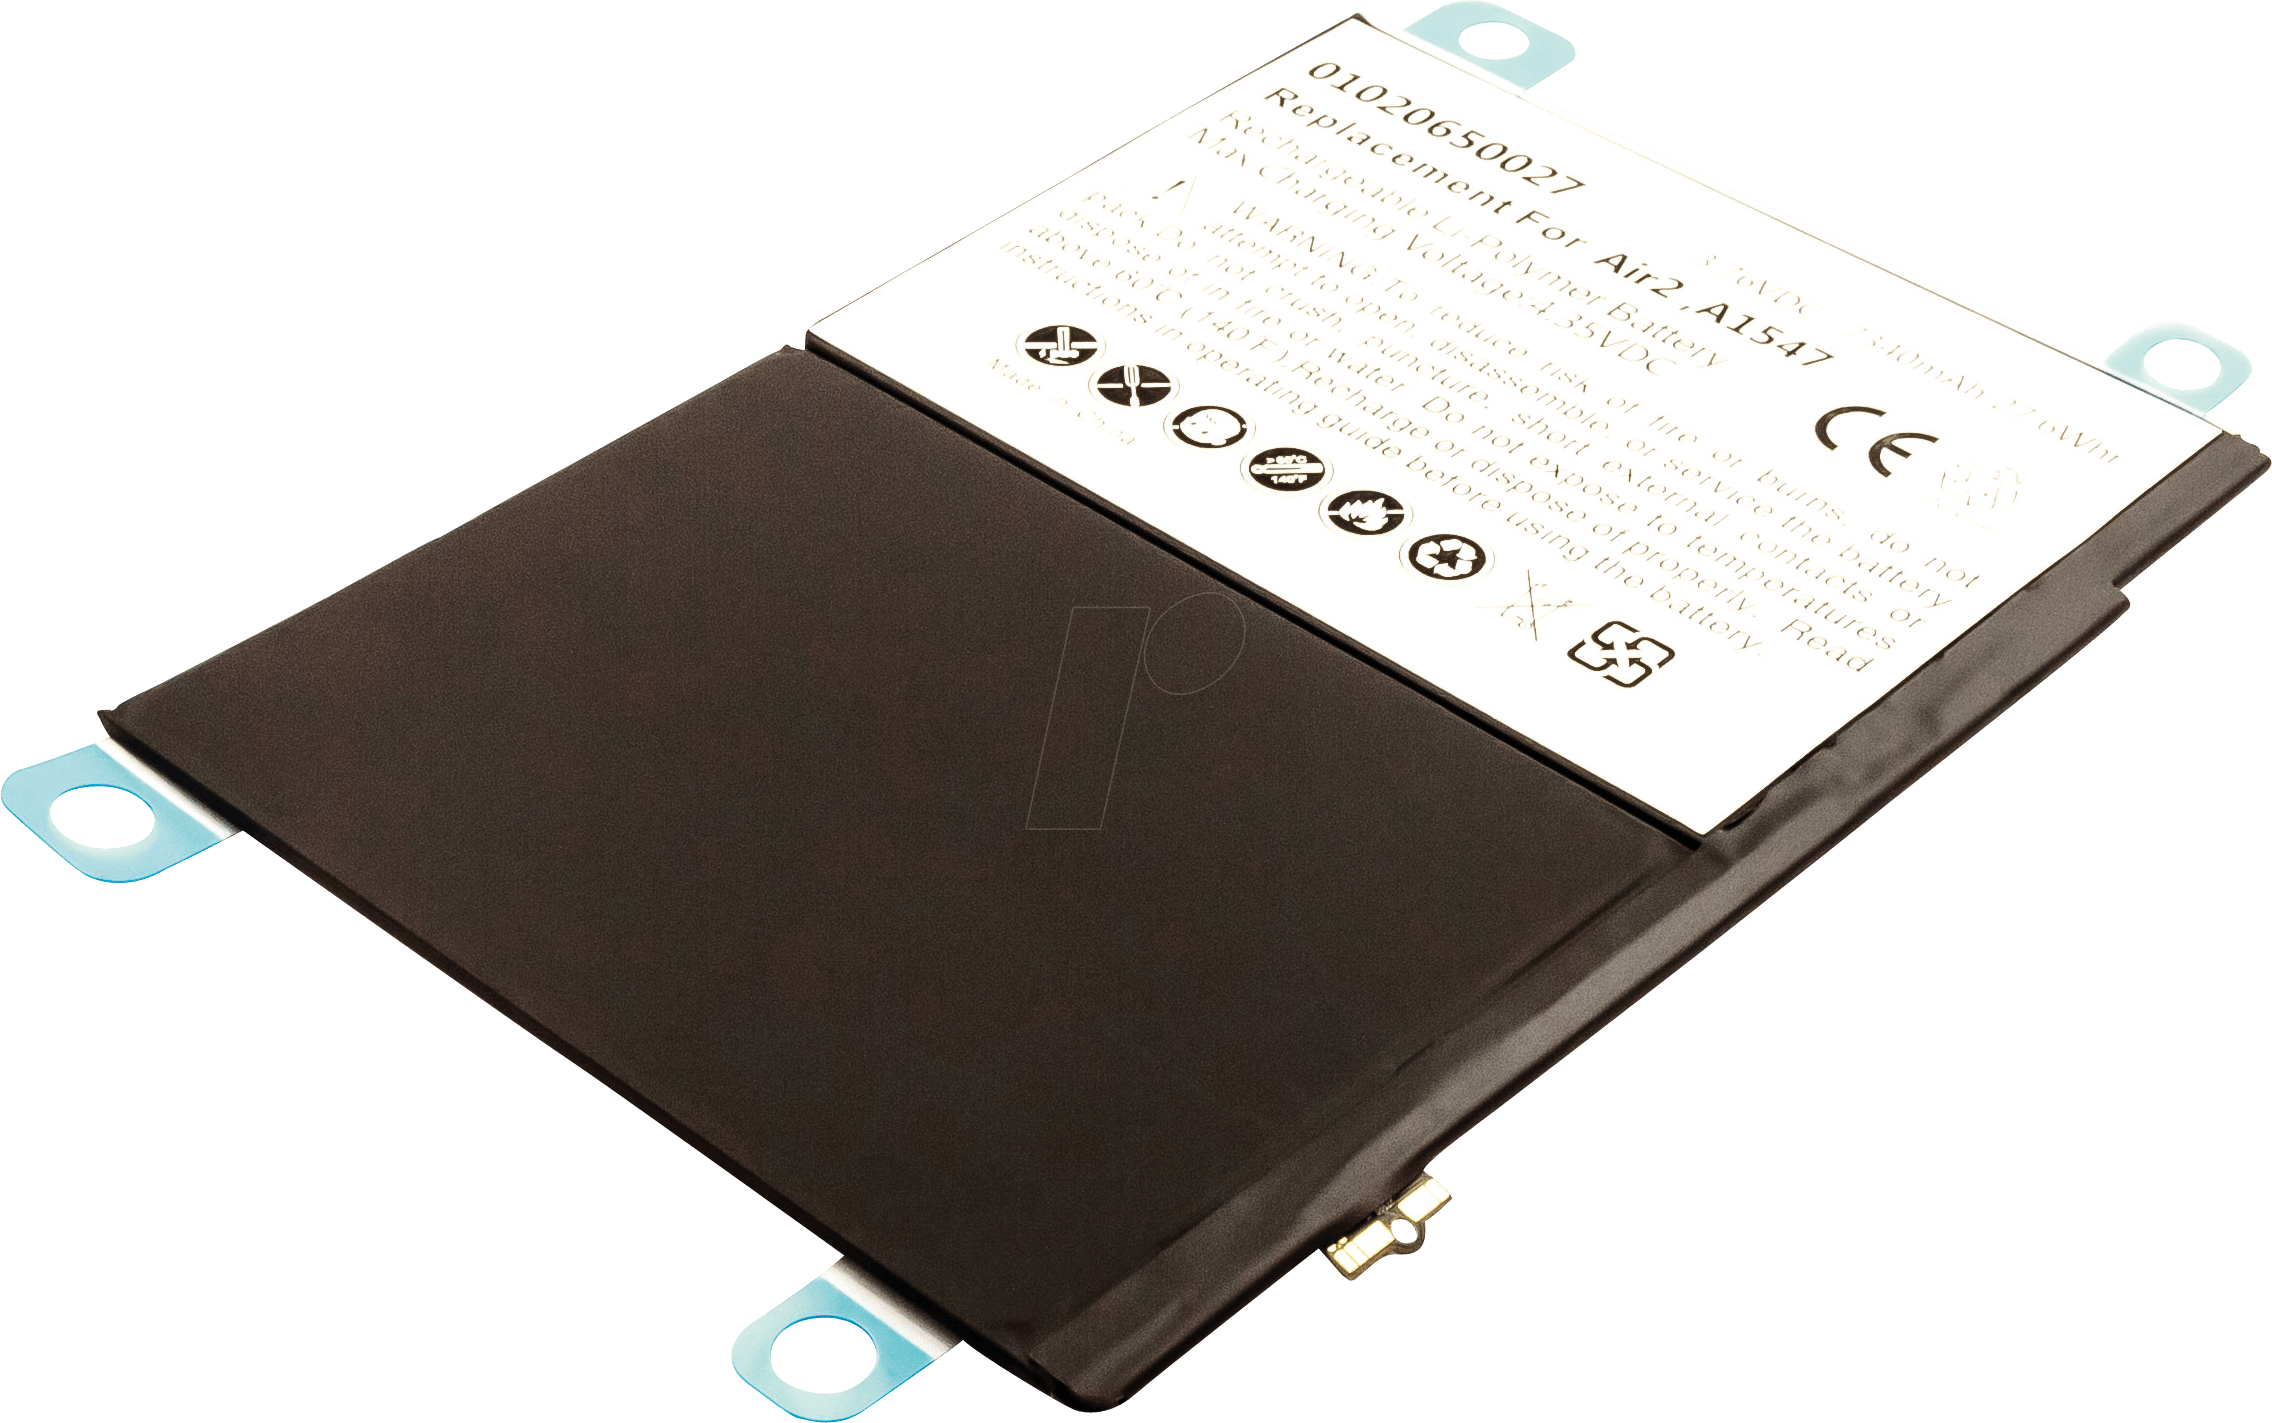 AKKU 53760 - Tablet battery for Apple iPad 6, iPad Air 2, Li-Po, 7340 mAh